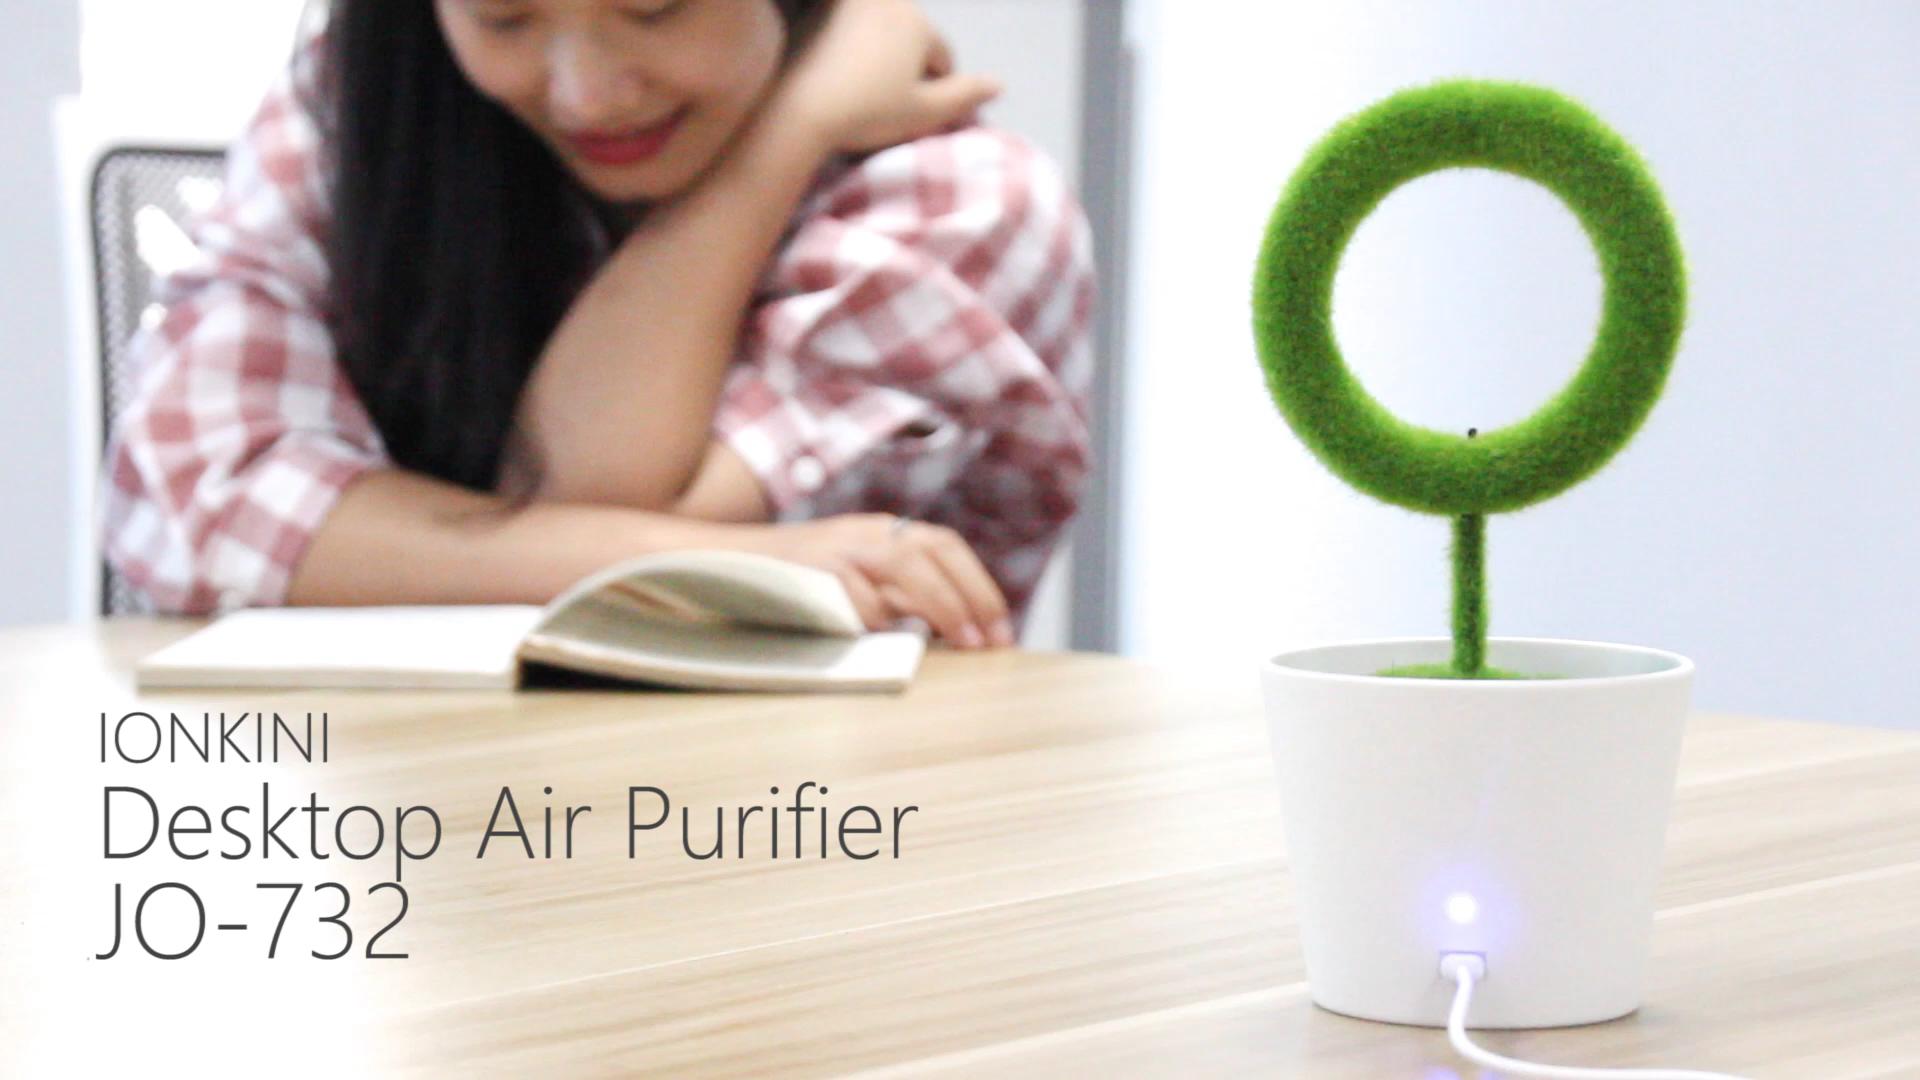 Ionkini JO-732 Indoor Decorative Bonsai Green Plant Office Air Purifier